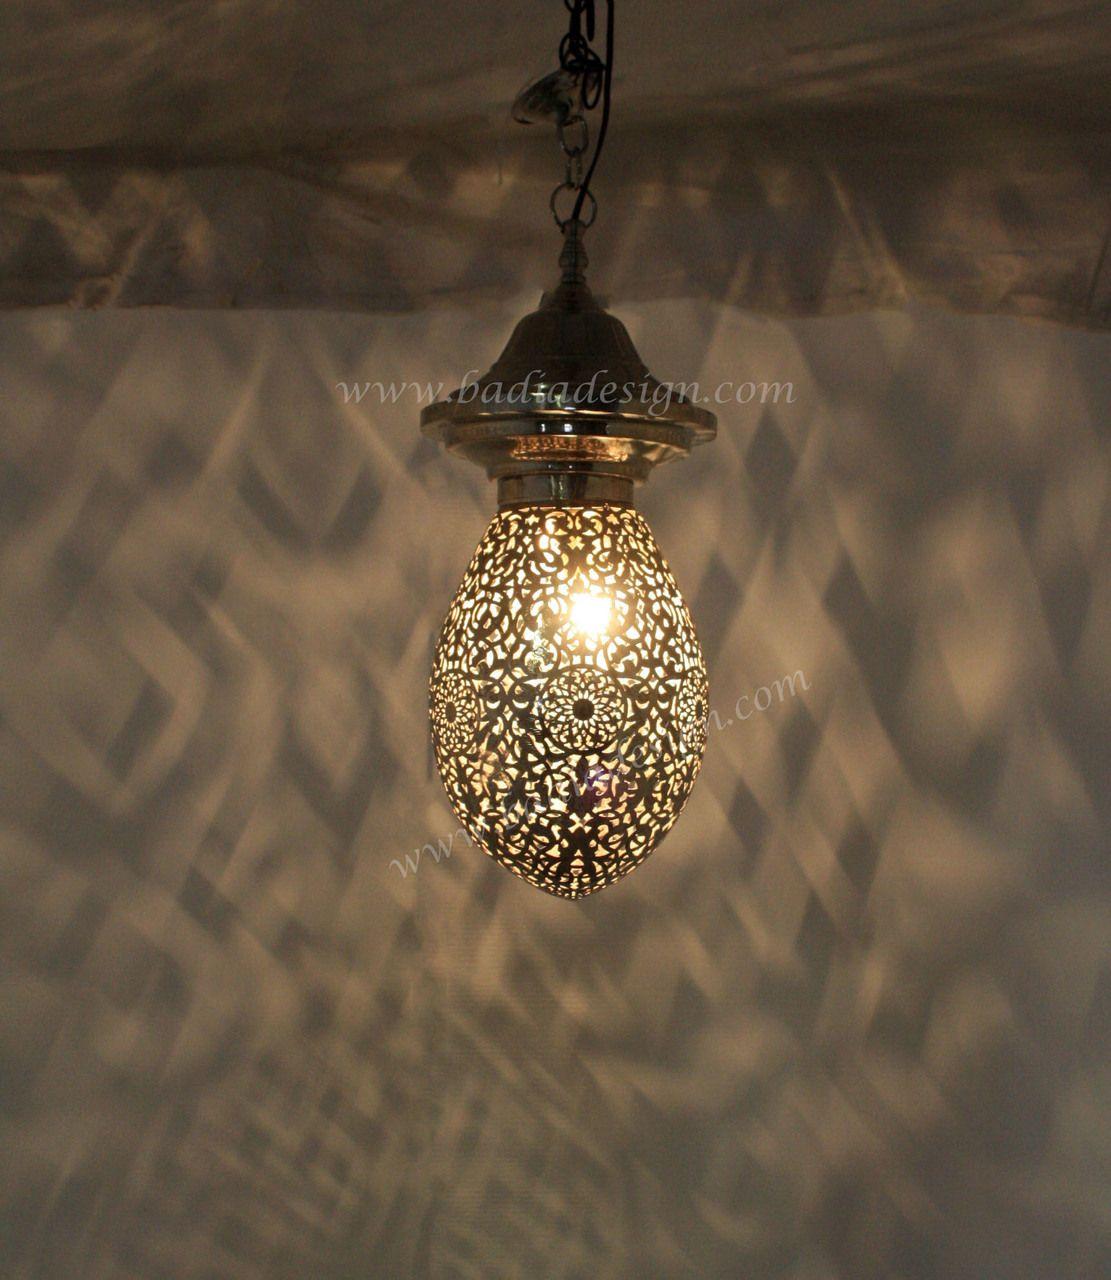 Badia Design Inc Store   Teardrop Shaped Brass Lantern   LIG135, $575.00  (http: